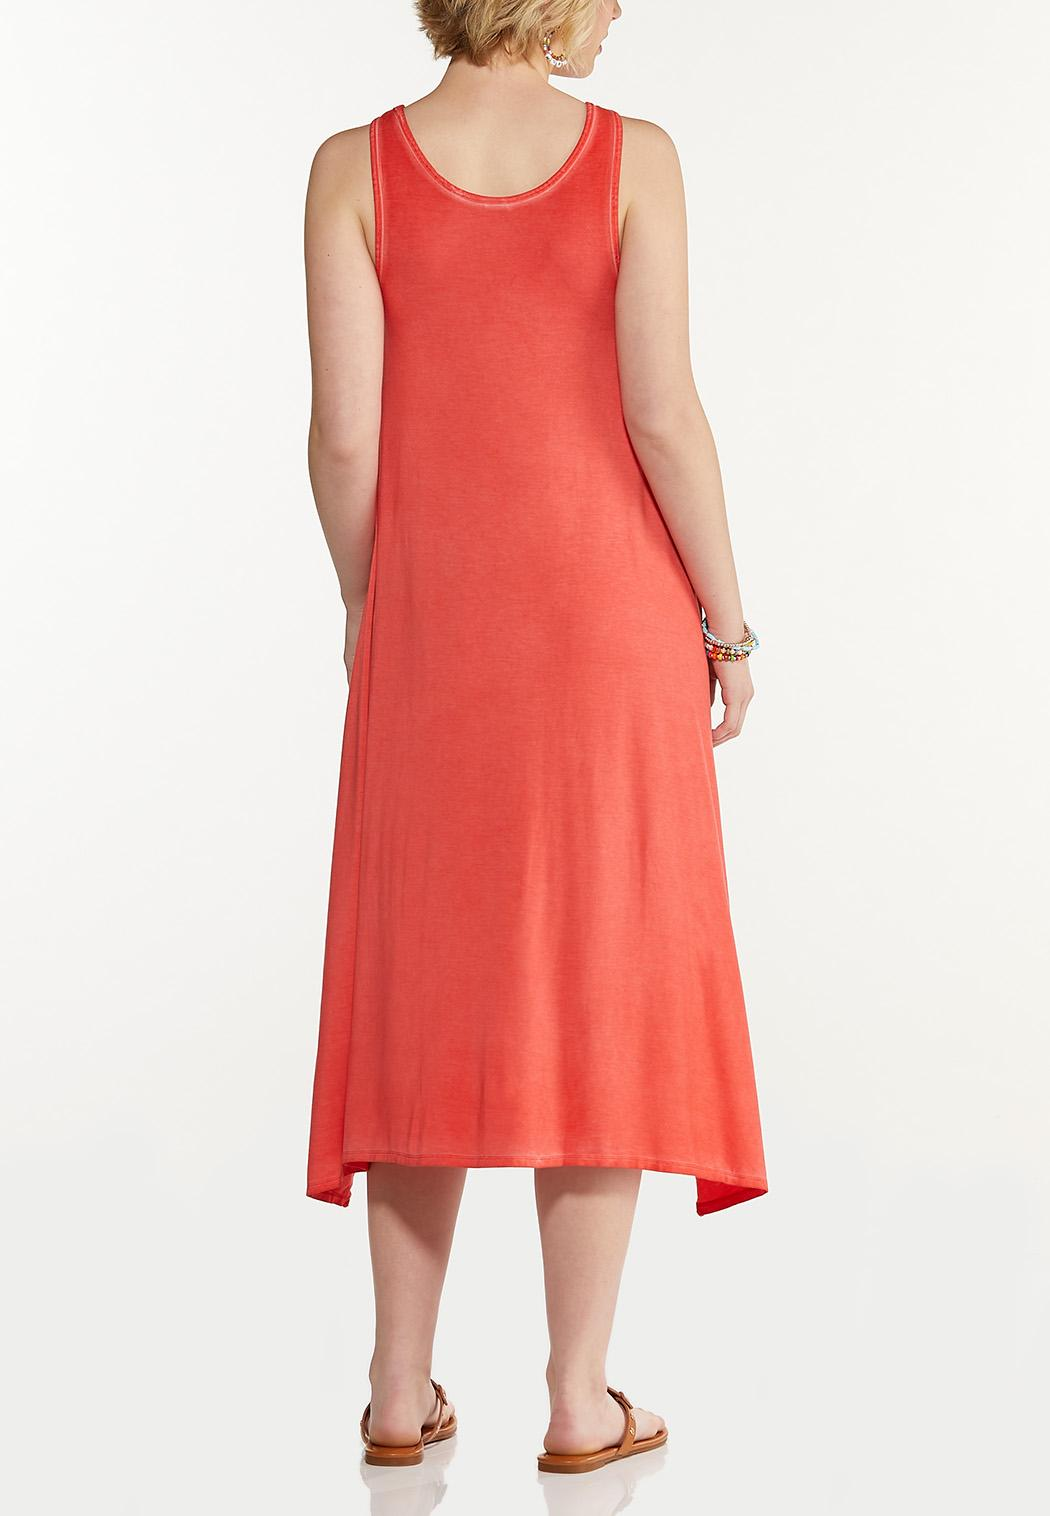 Plus Size Summer Soul Tank Dress (Item #44576045)